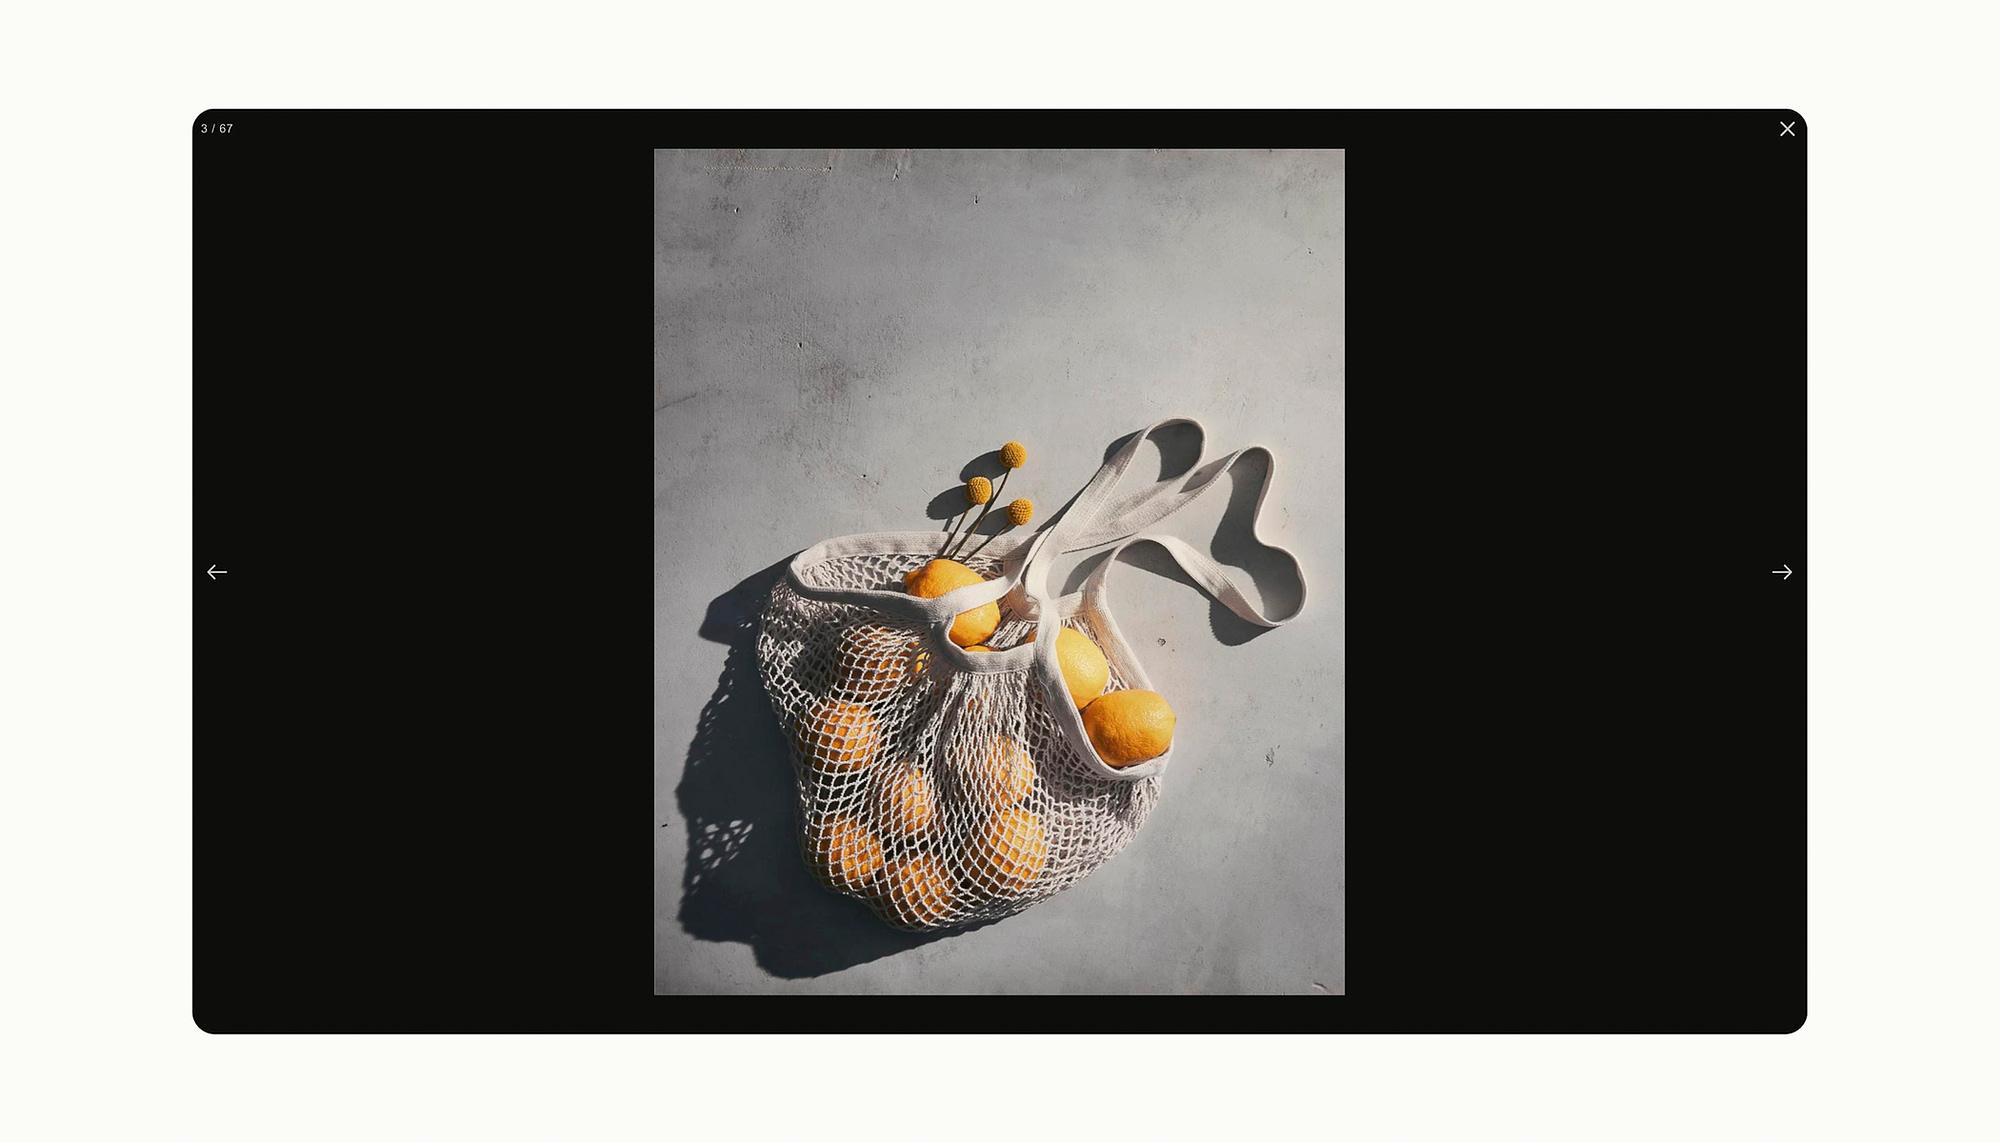 sparks-photographers-website-design-ux-anielika-sykes-6